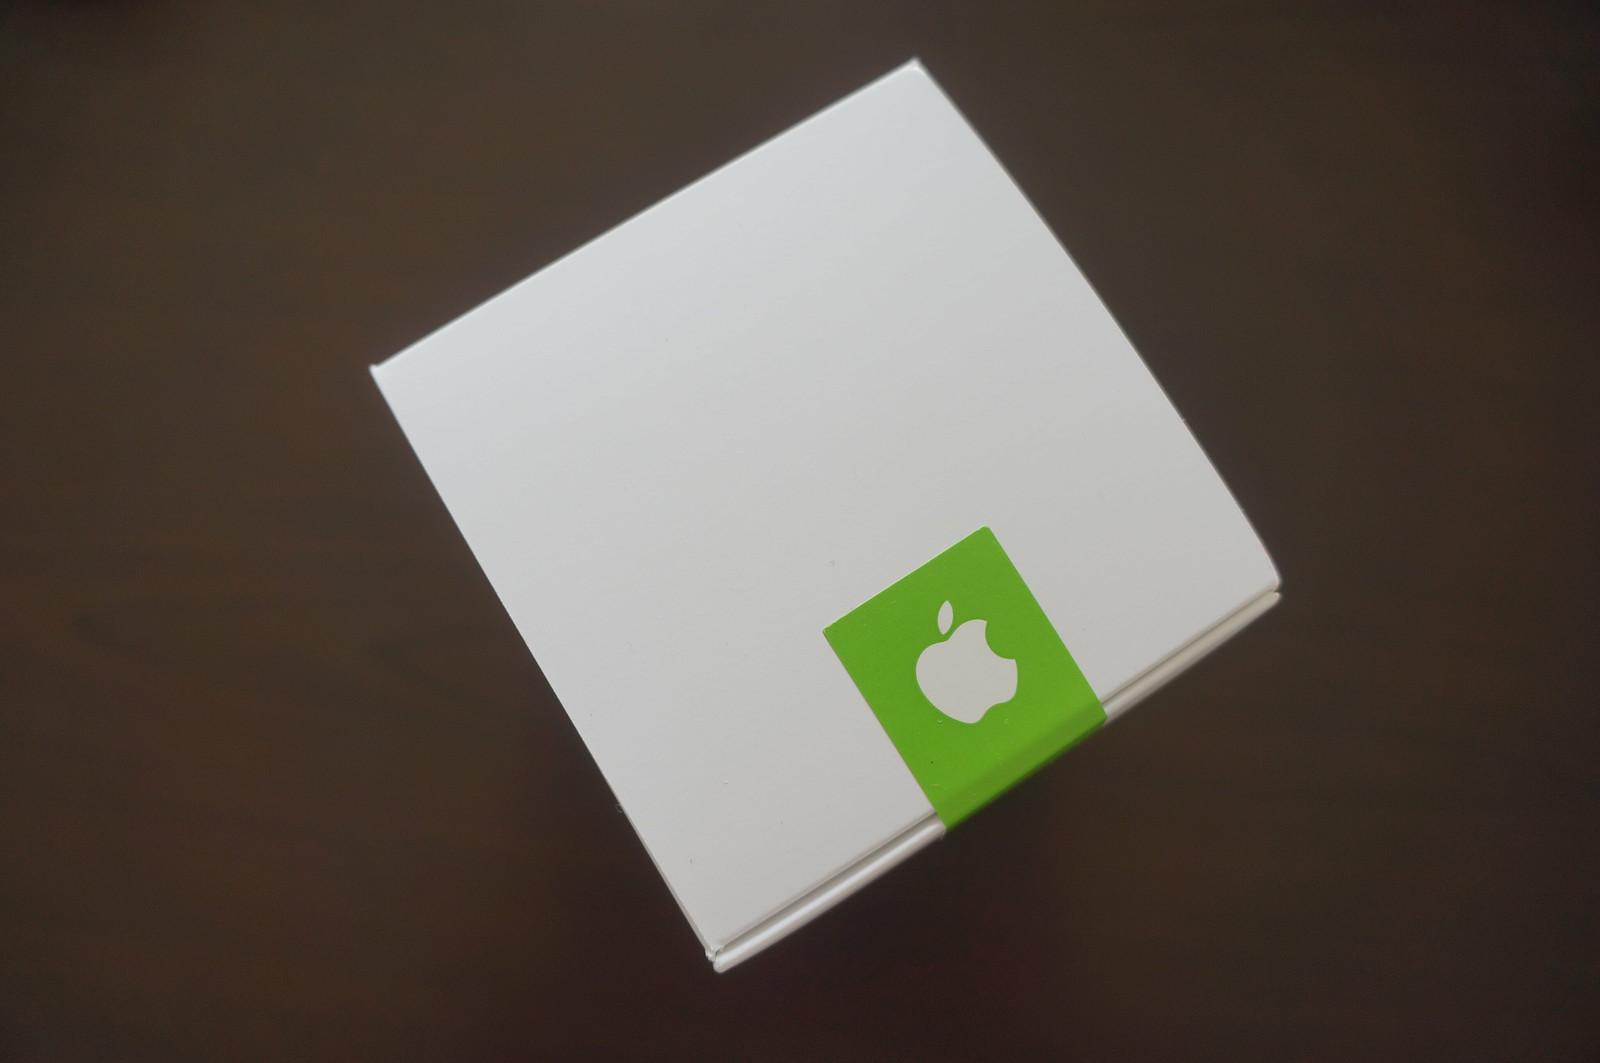 Apple Store表参道のオリジナルTシャツが入った白い箱